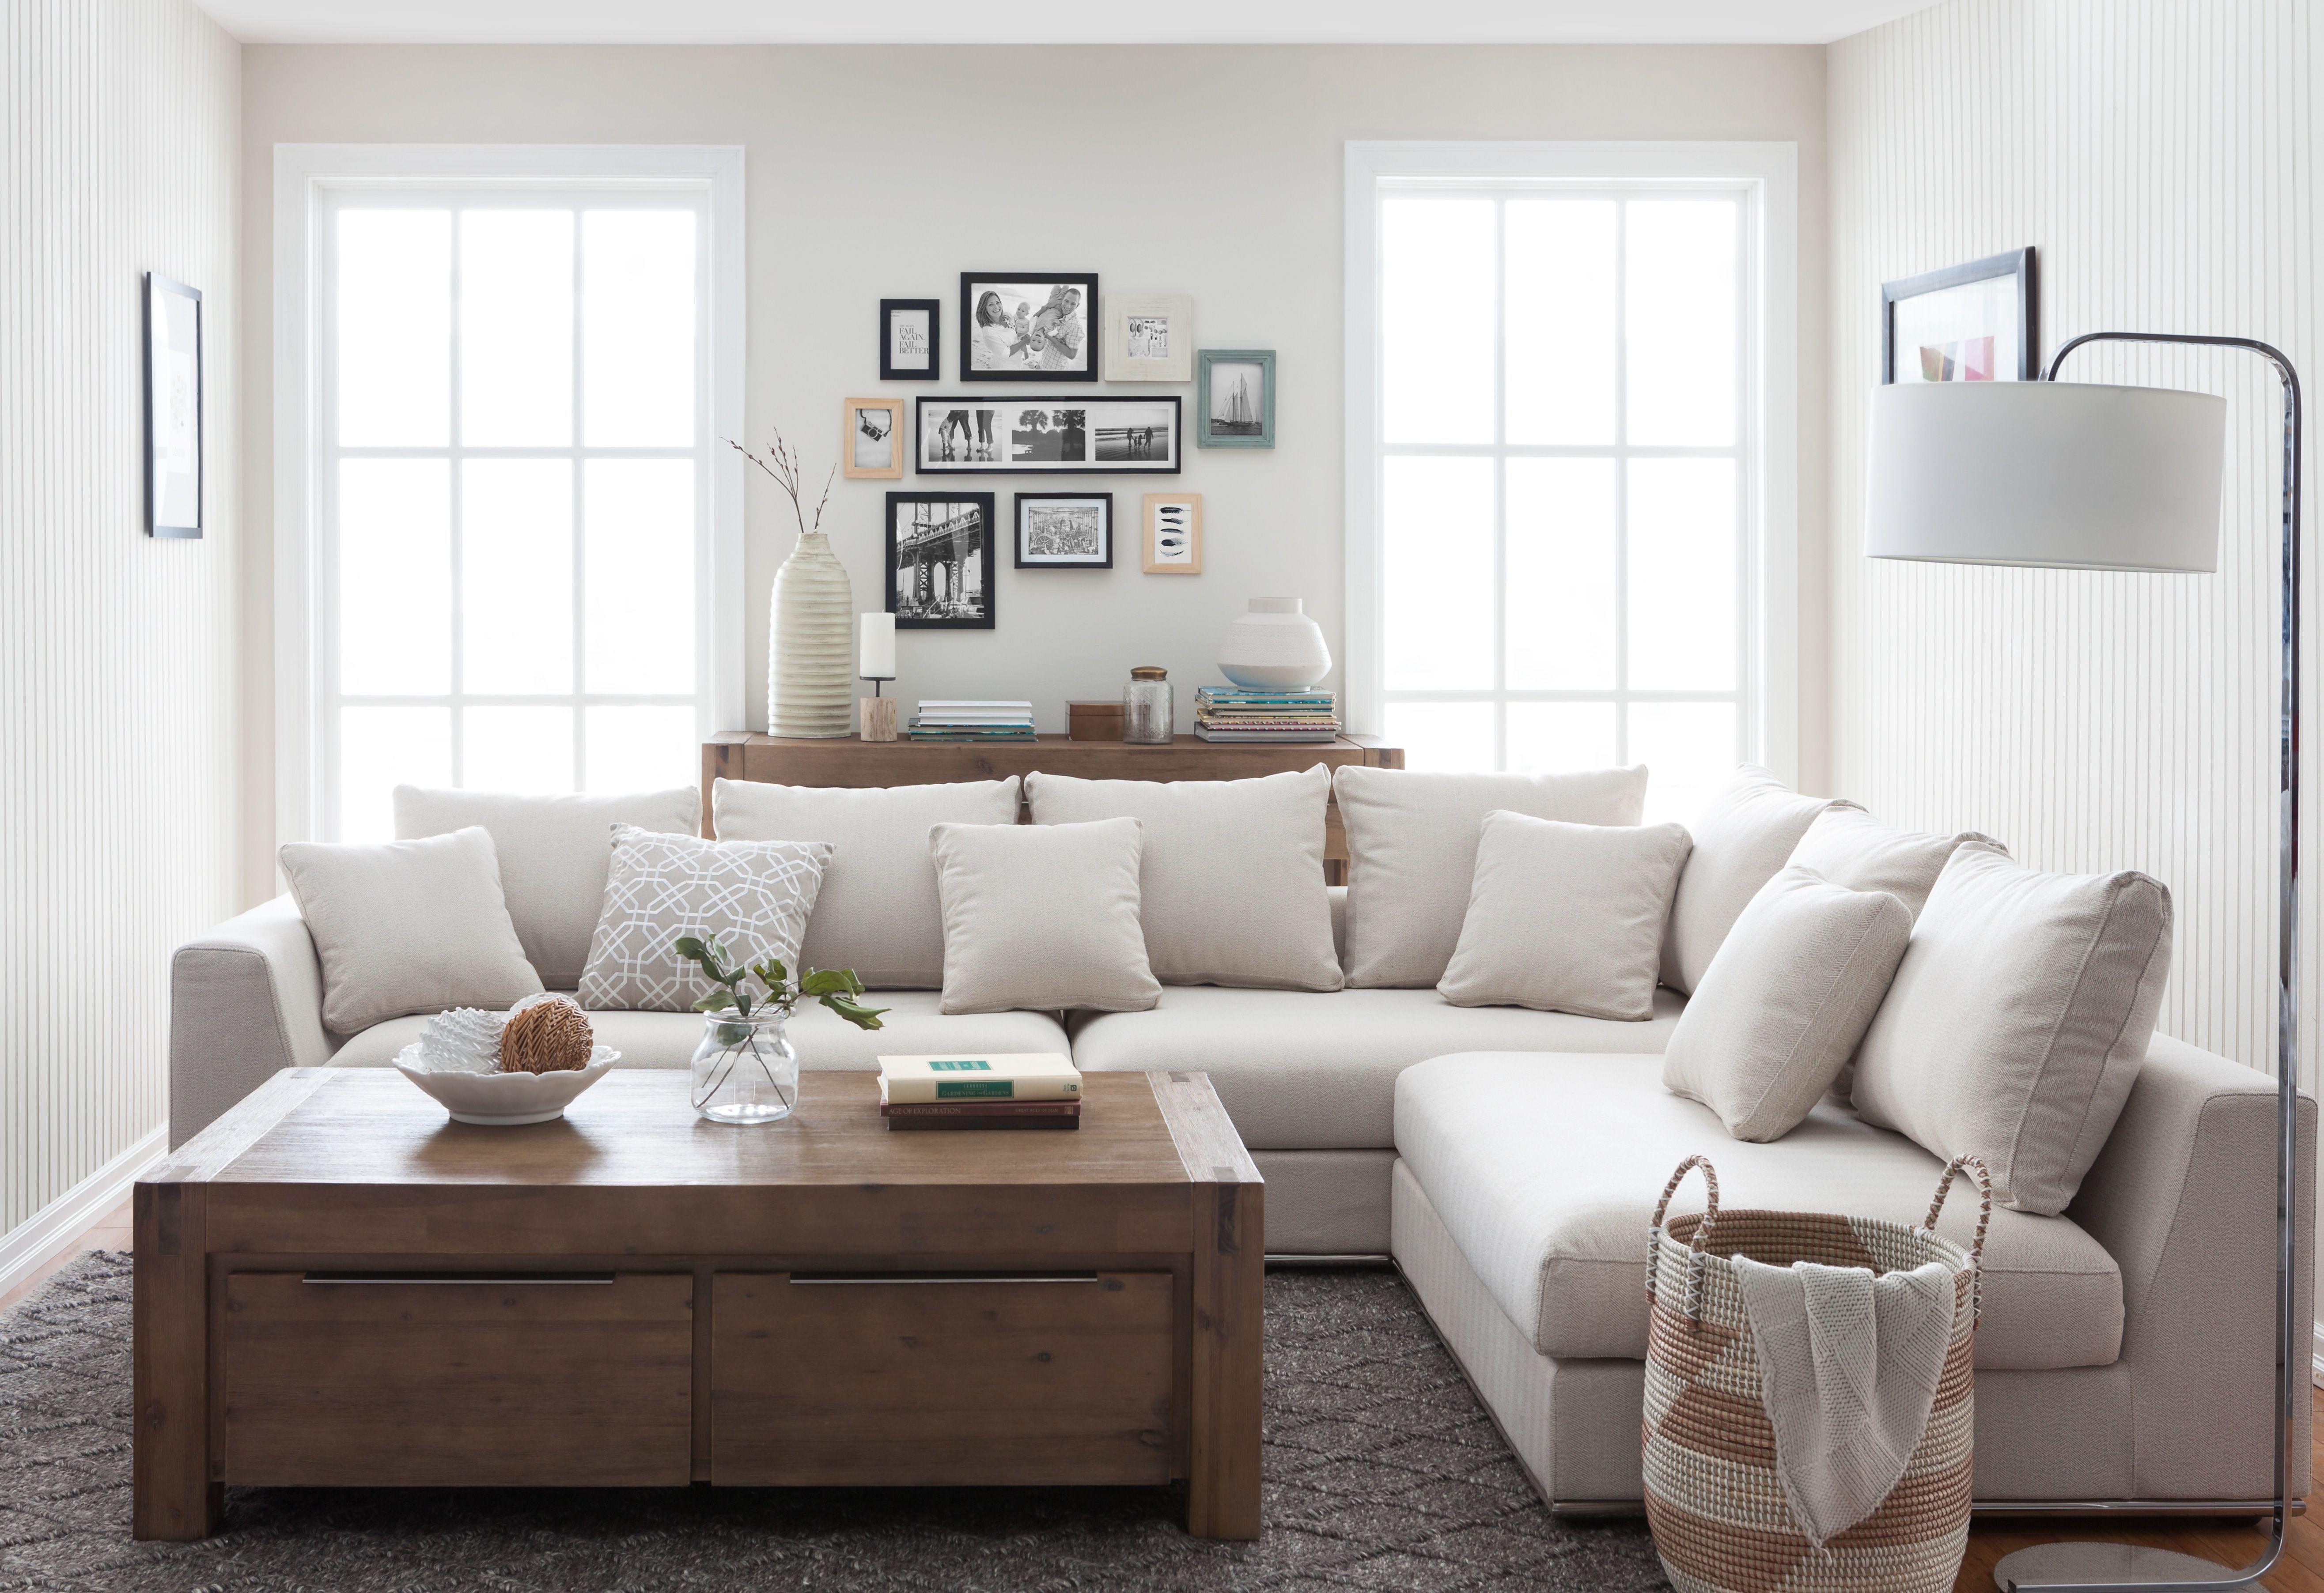 Garden Design Modular Sectional Sofa Beige Living Rooms Li